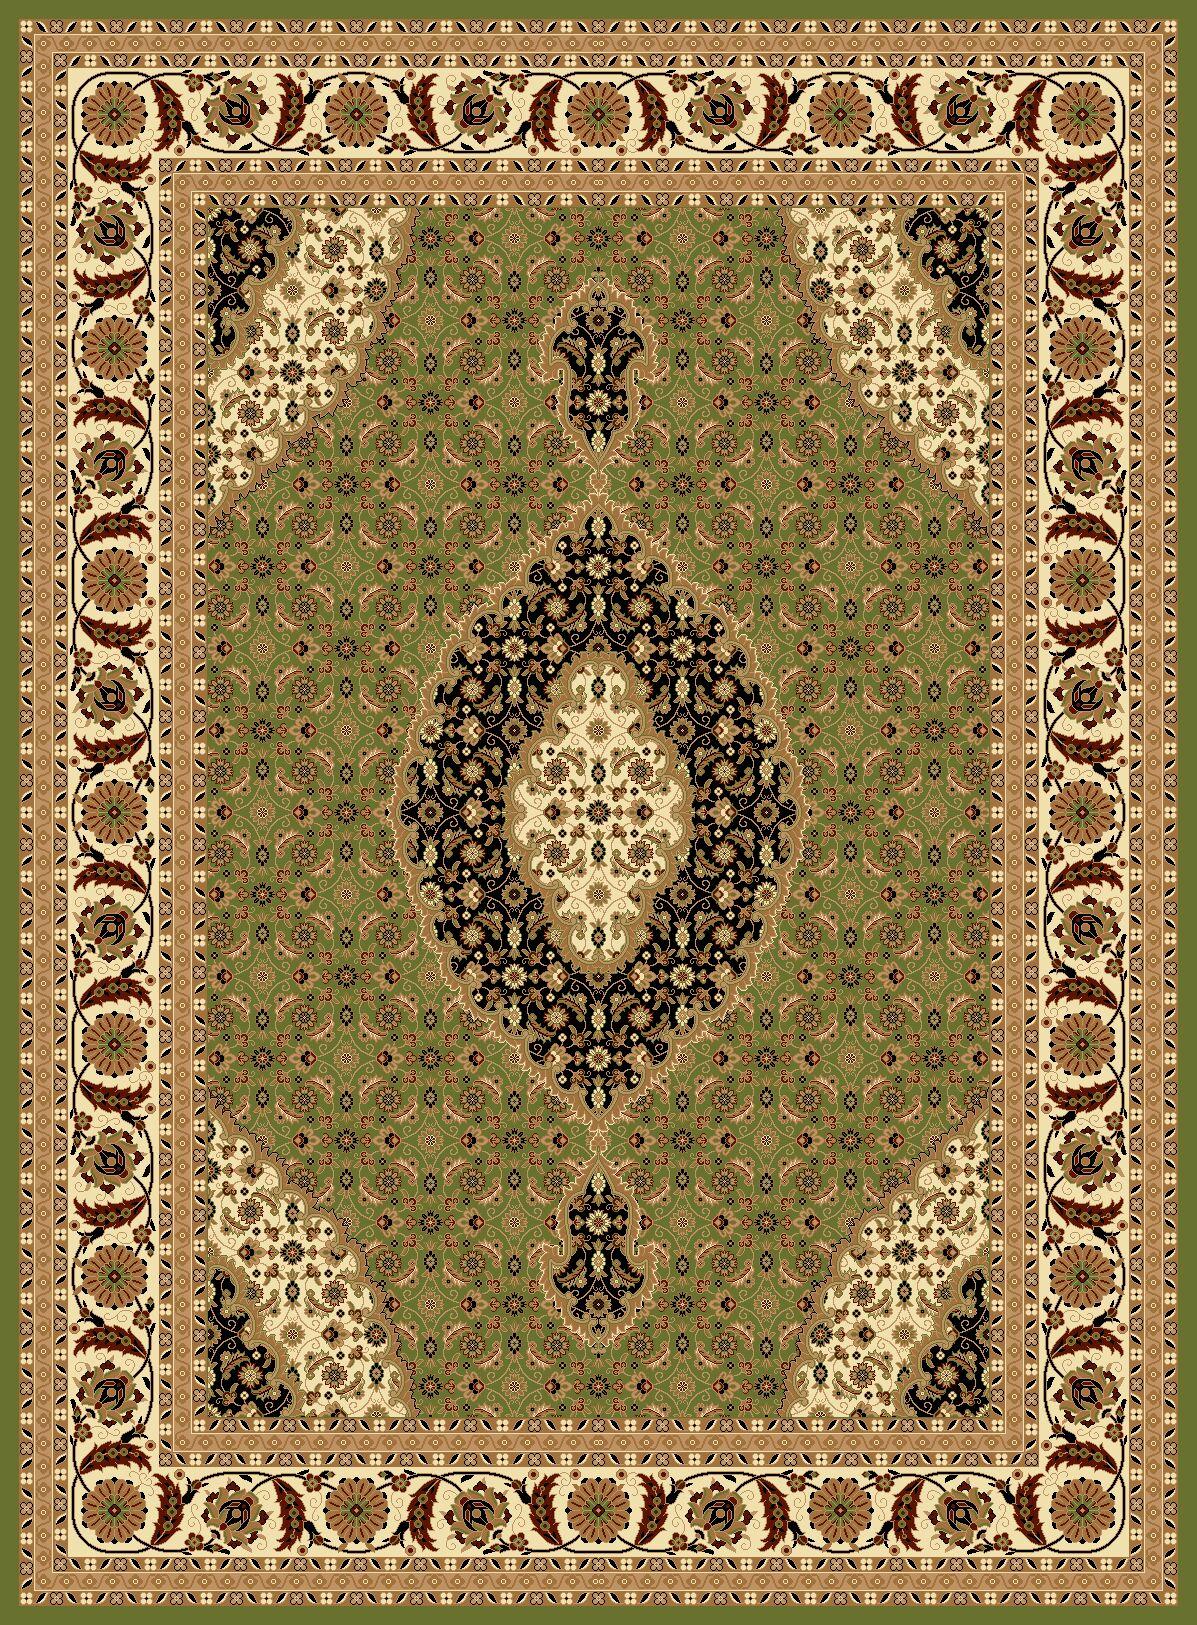 Mona Lisa Green Area Rug Rug Size: Rectangle 7'11